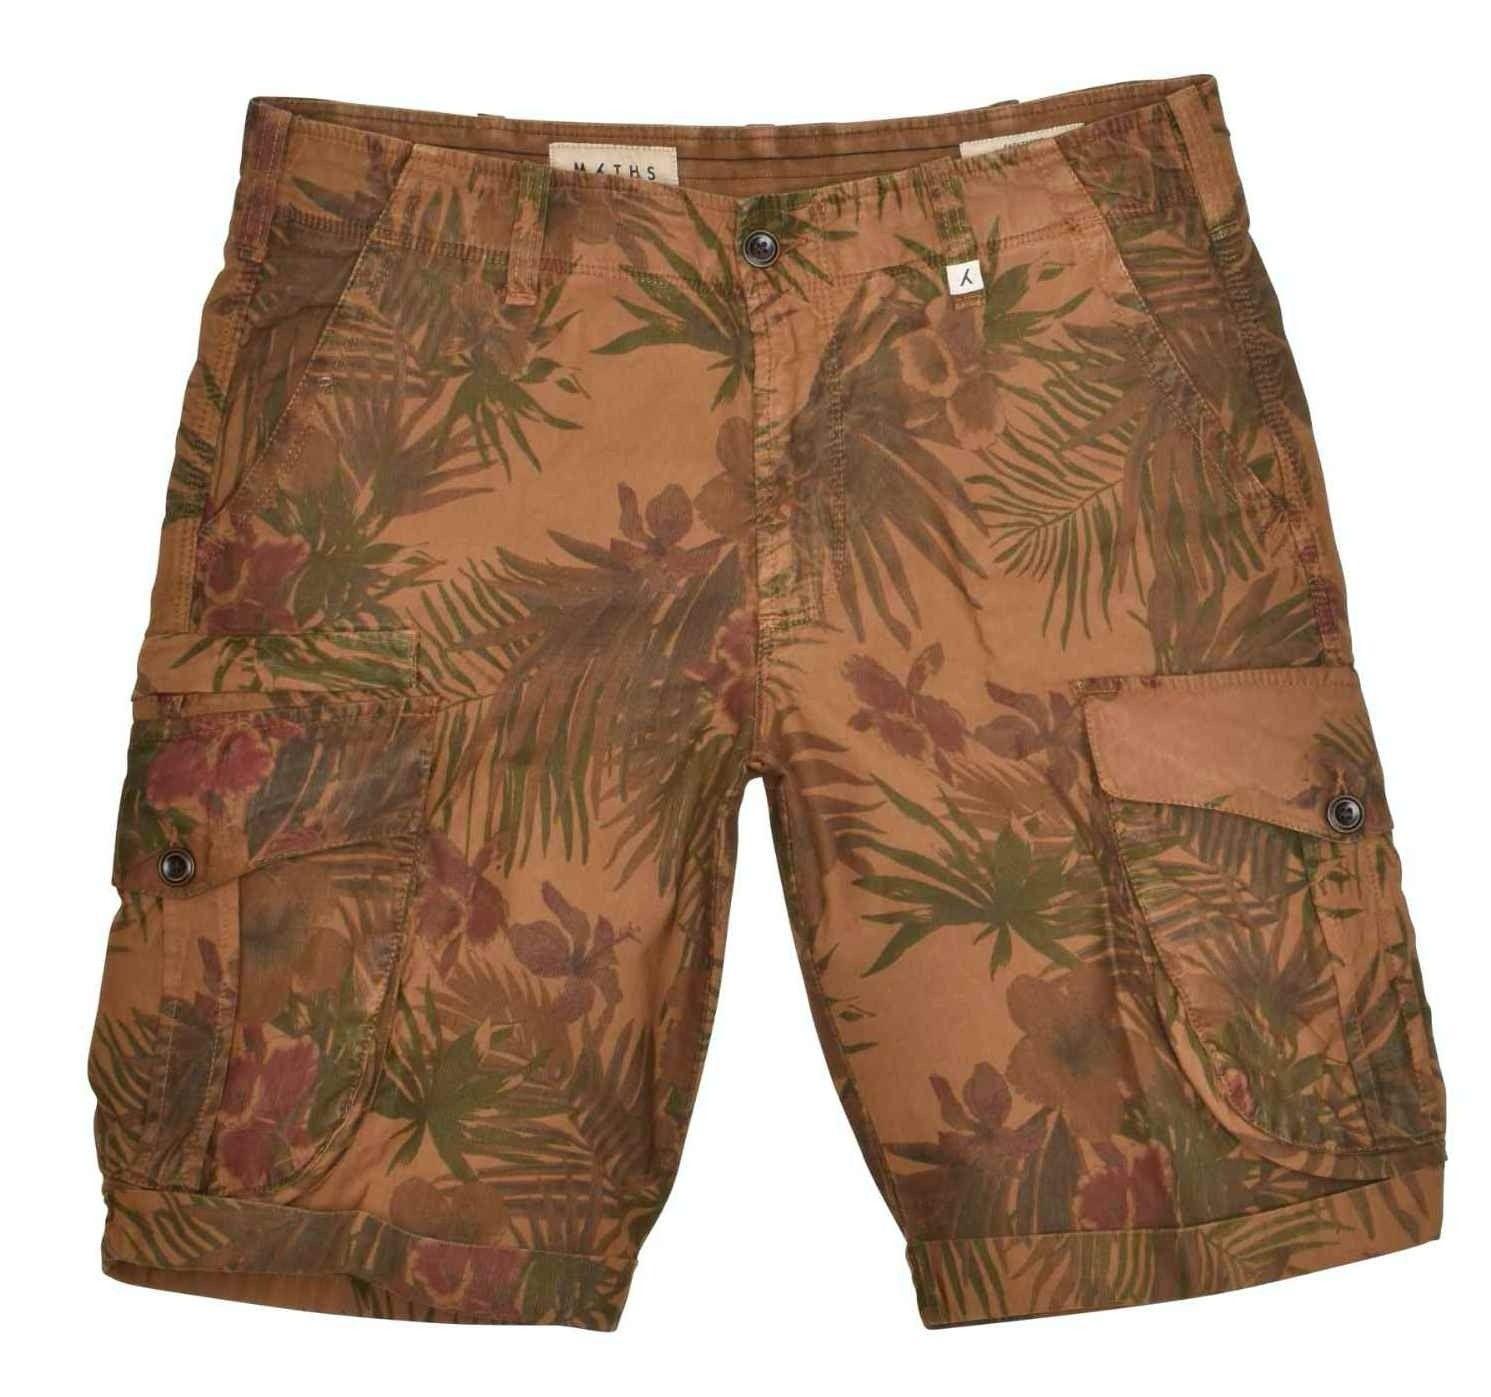 MYTHS - Herren Shorts - Short Cargo Trousers - Caramel Hibiskus